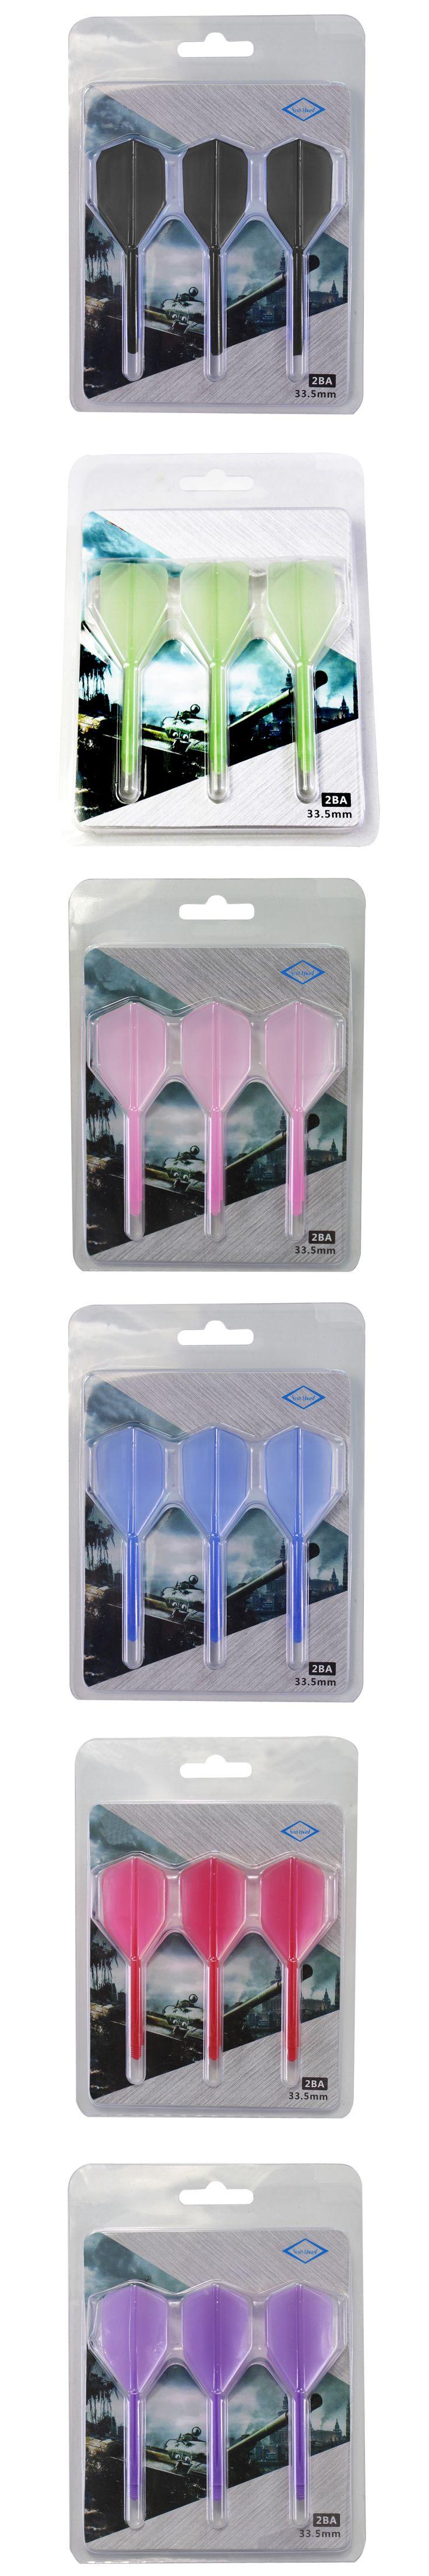 2BA Screw Soft Light-weight Flexible Durable Anti-fall Integrated Dart Flight, In-one Flight, Dart Accessories, 3 PCS Packed